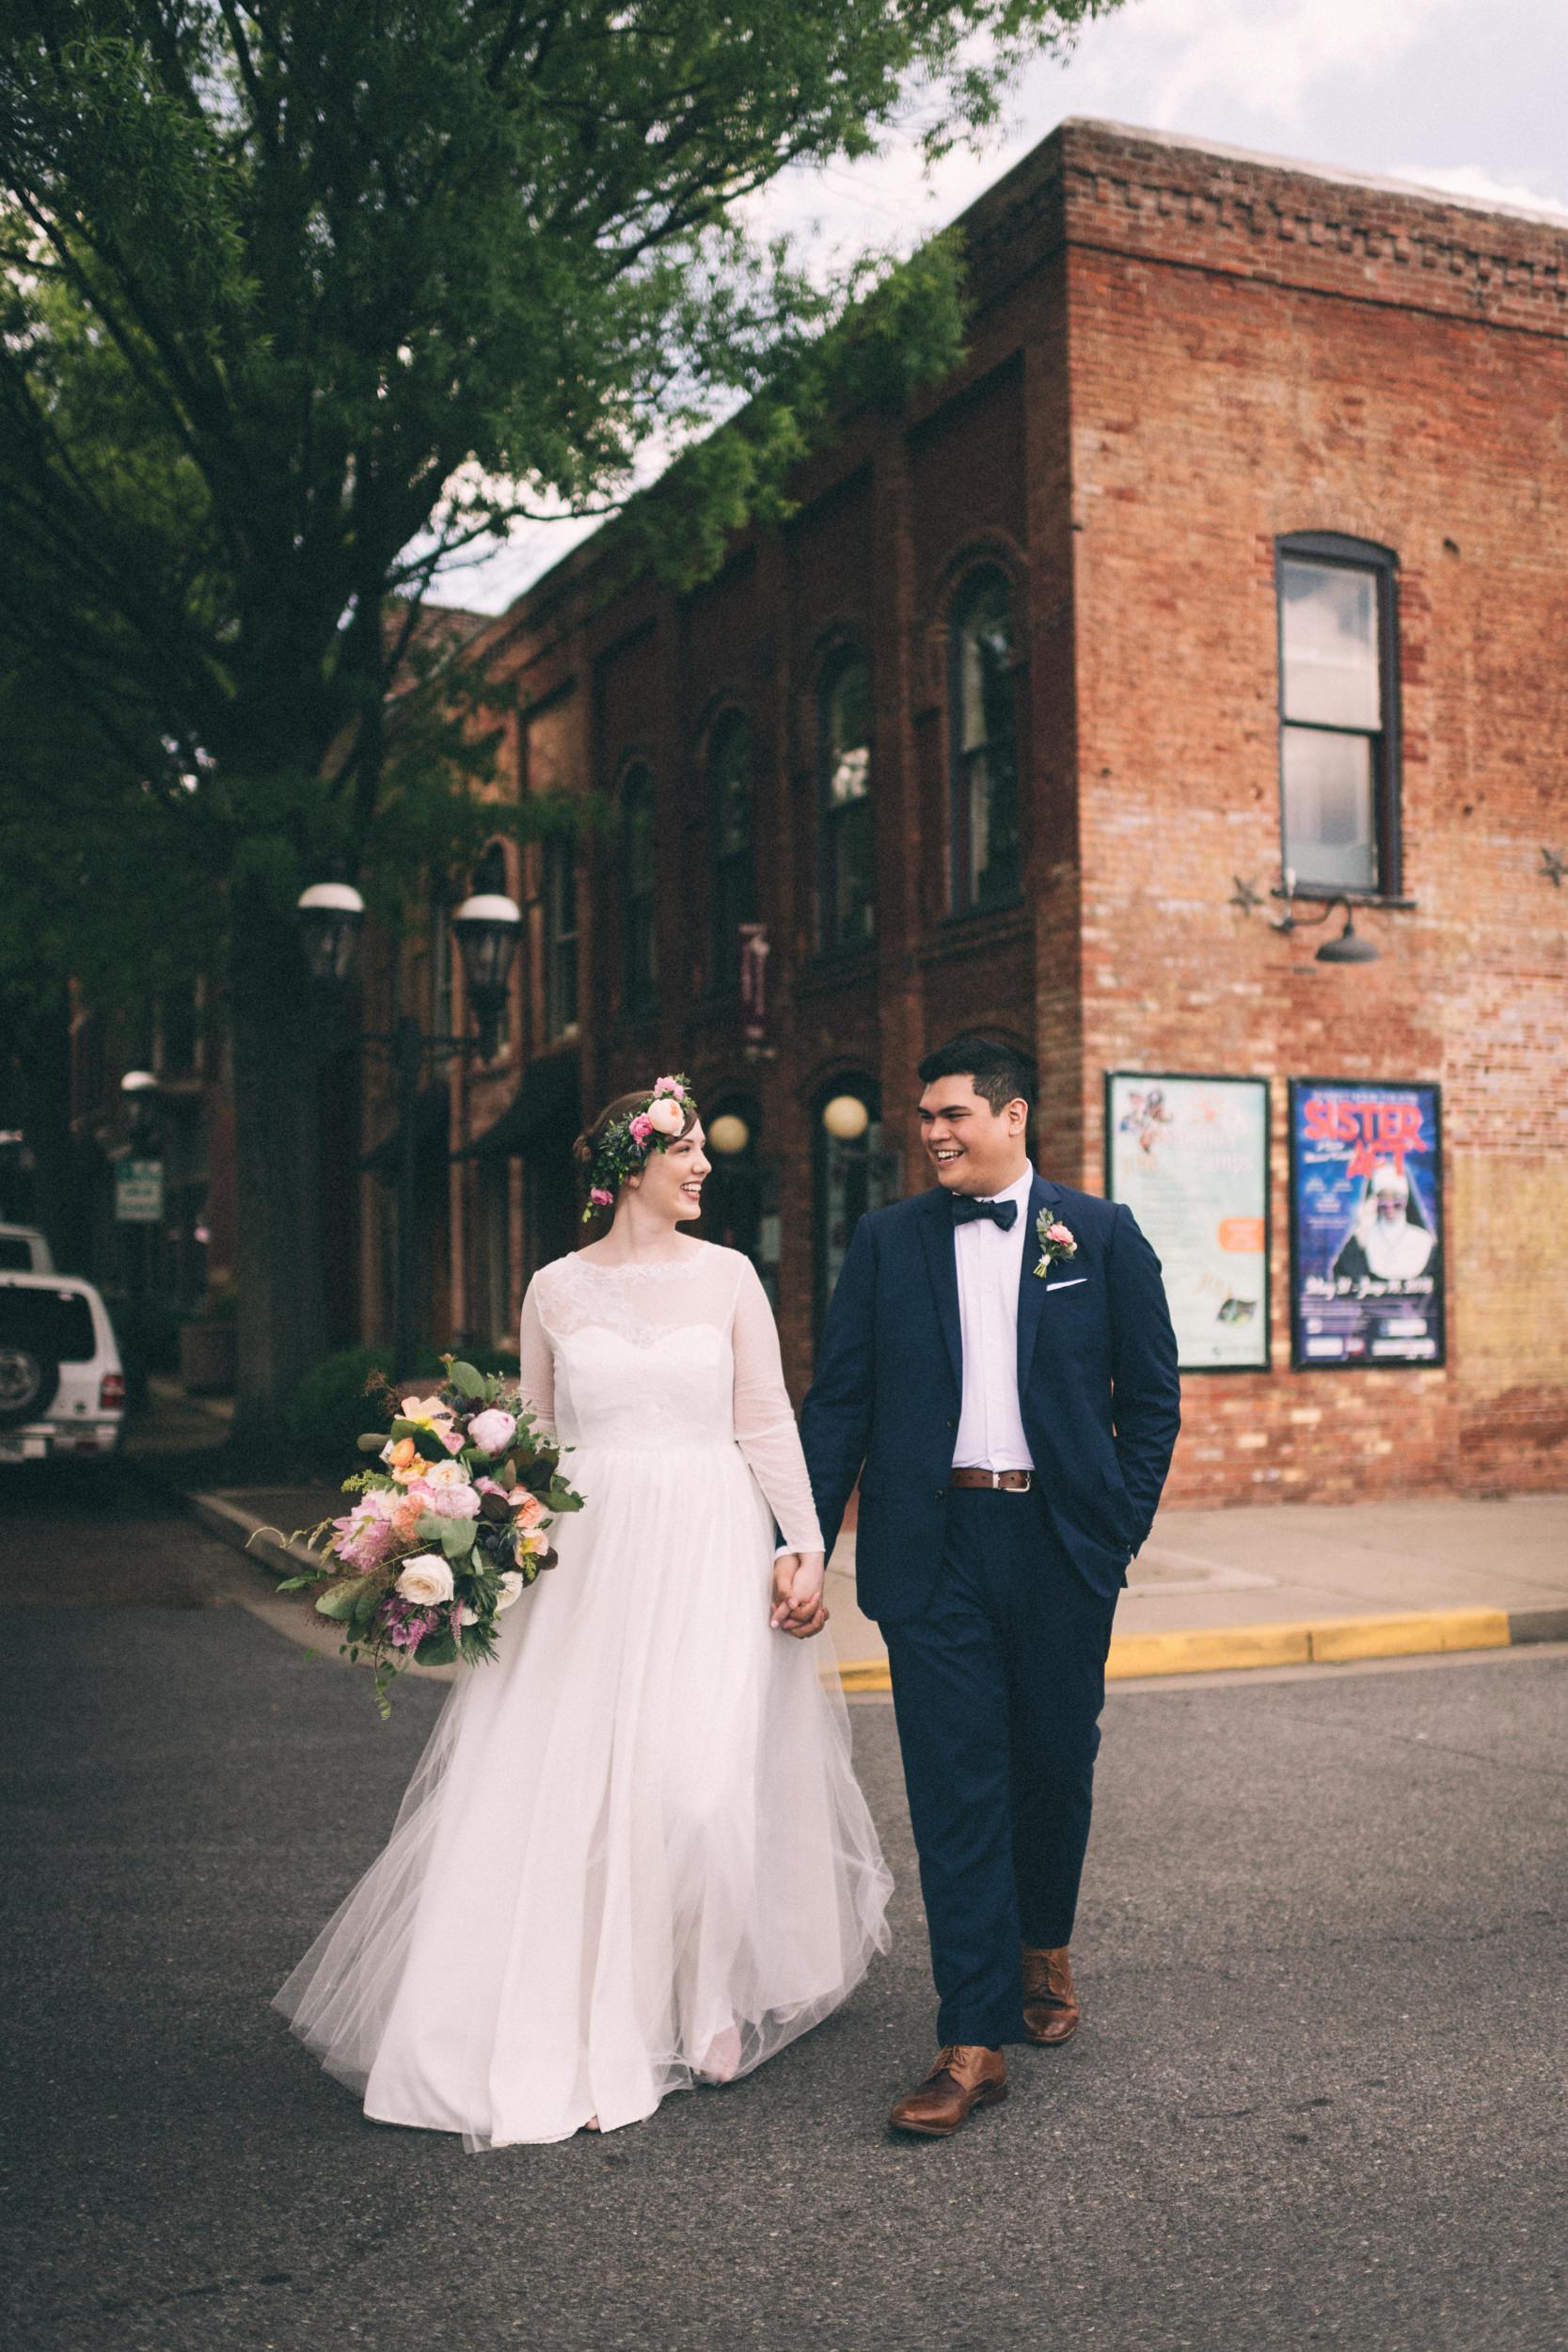 lauren-dean-wedding-grand-lodge-kentucky-sarah-katherine-davis-photography-234edit.jpg